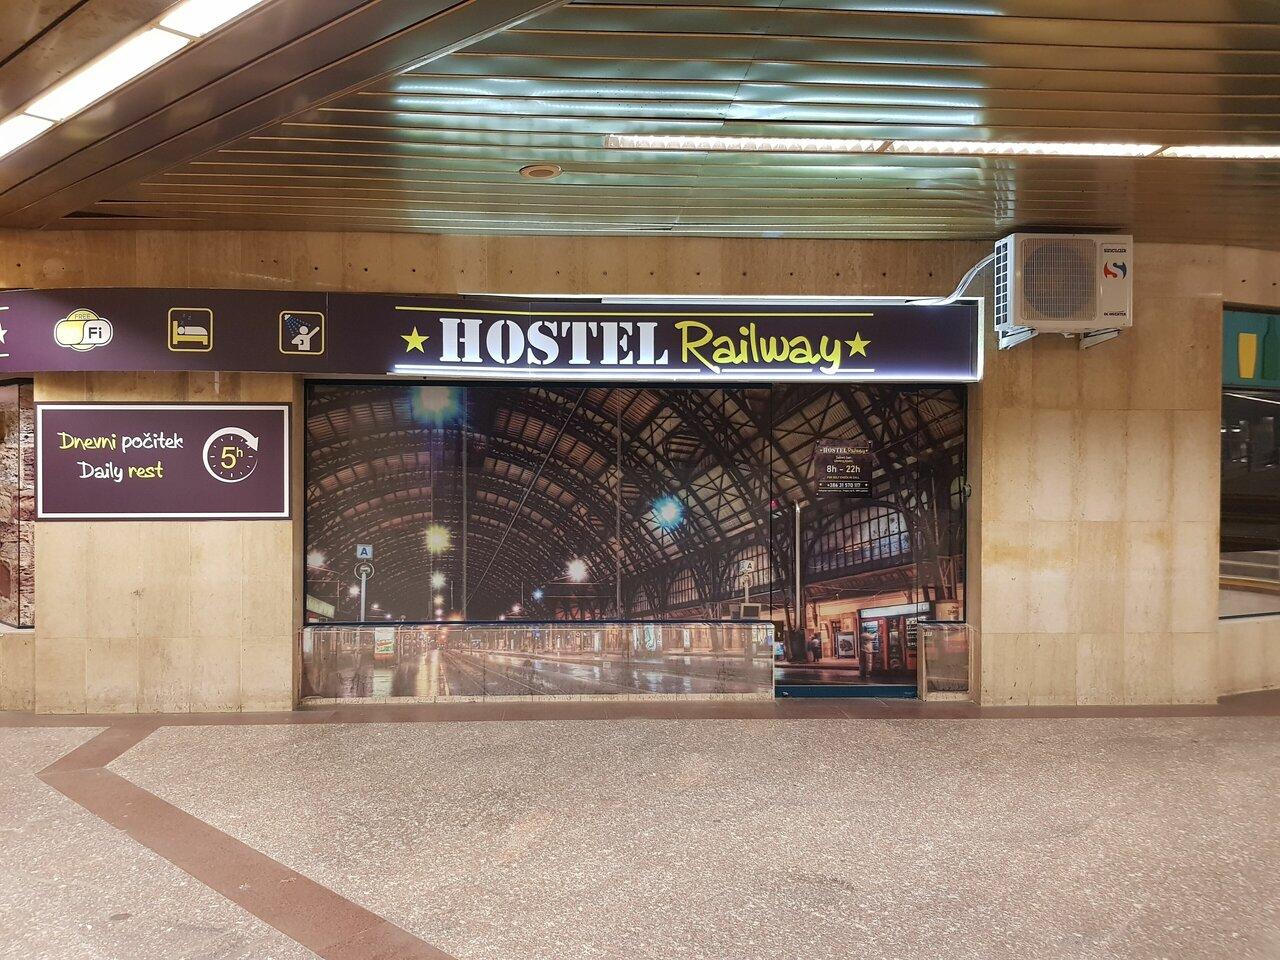 Hostel Railway